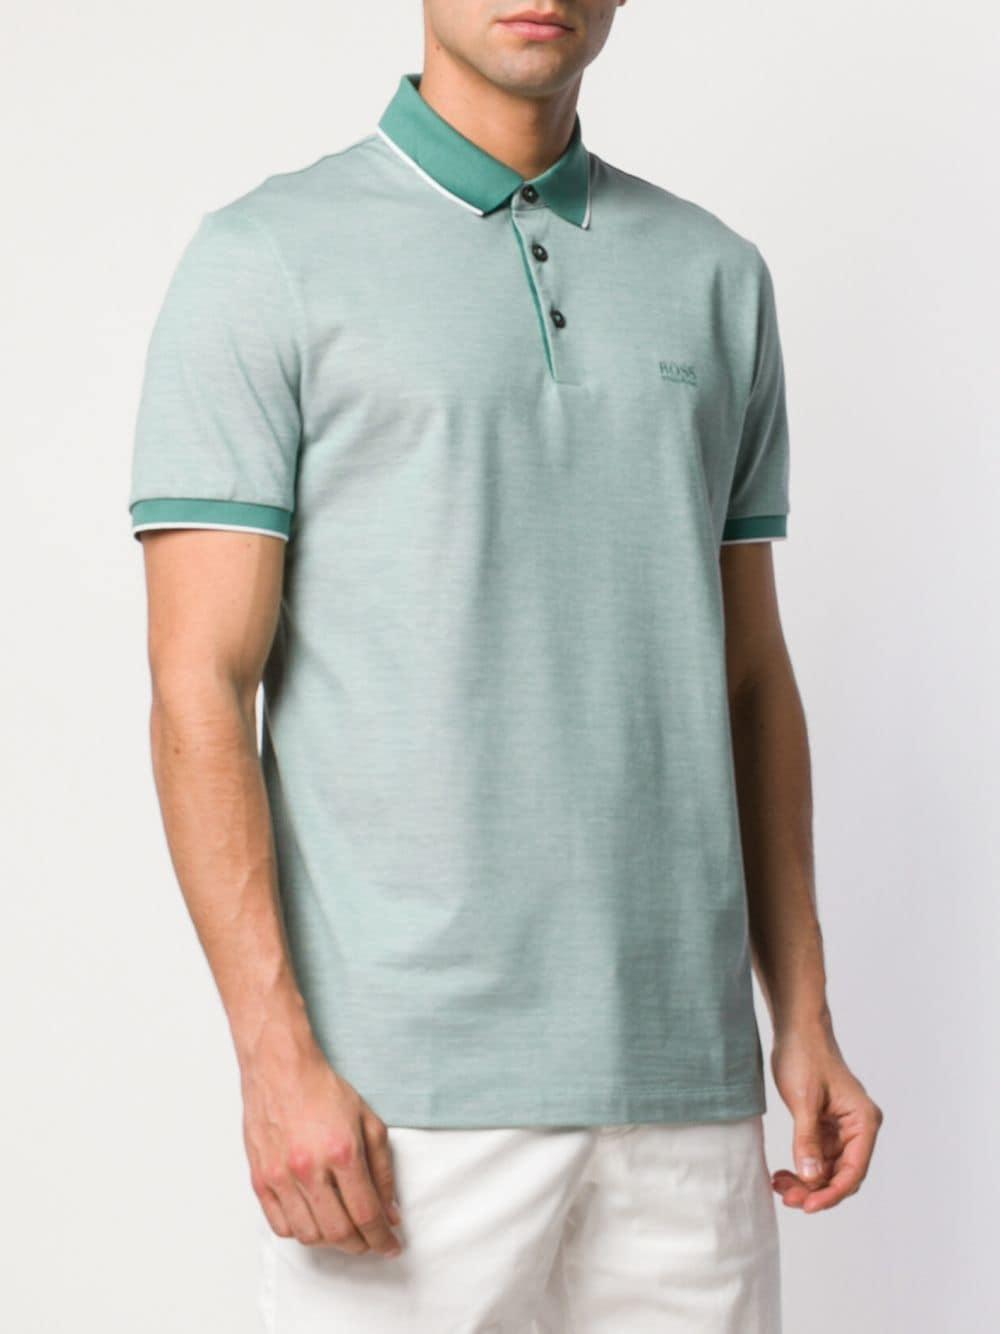 92c146e1 BOSS - Green Prout Polo Shirt for Men - Lyst. View fullscreen